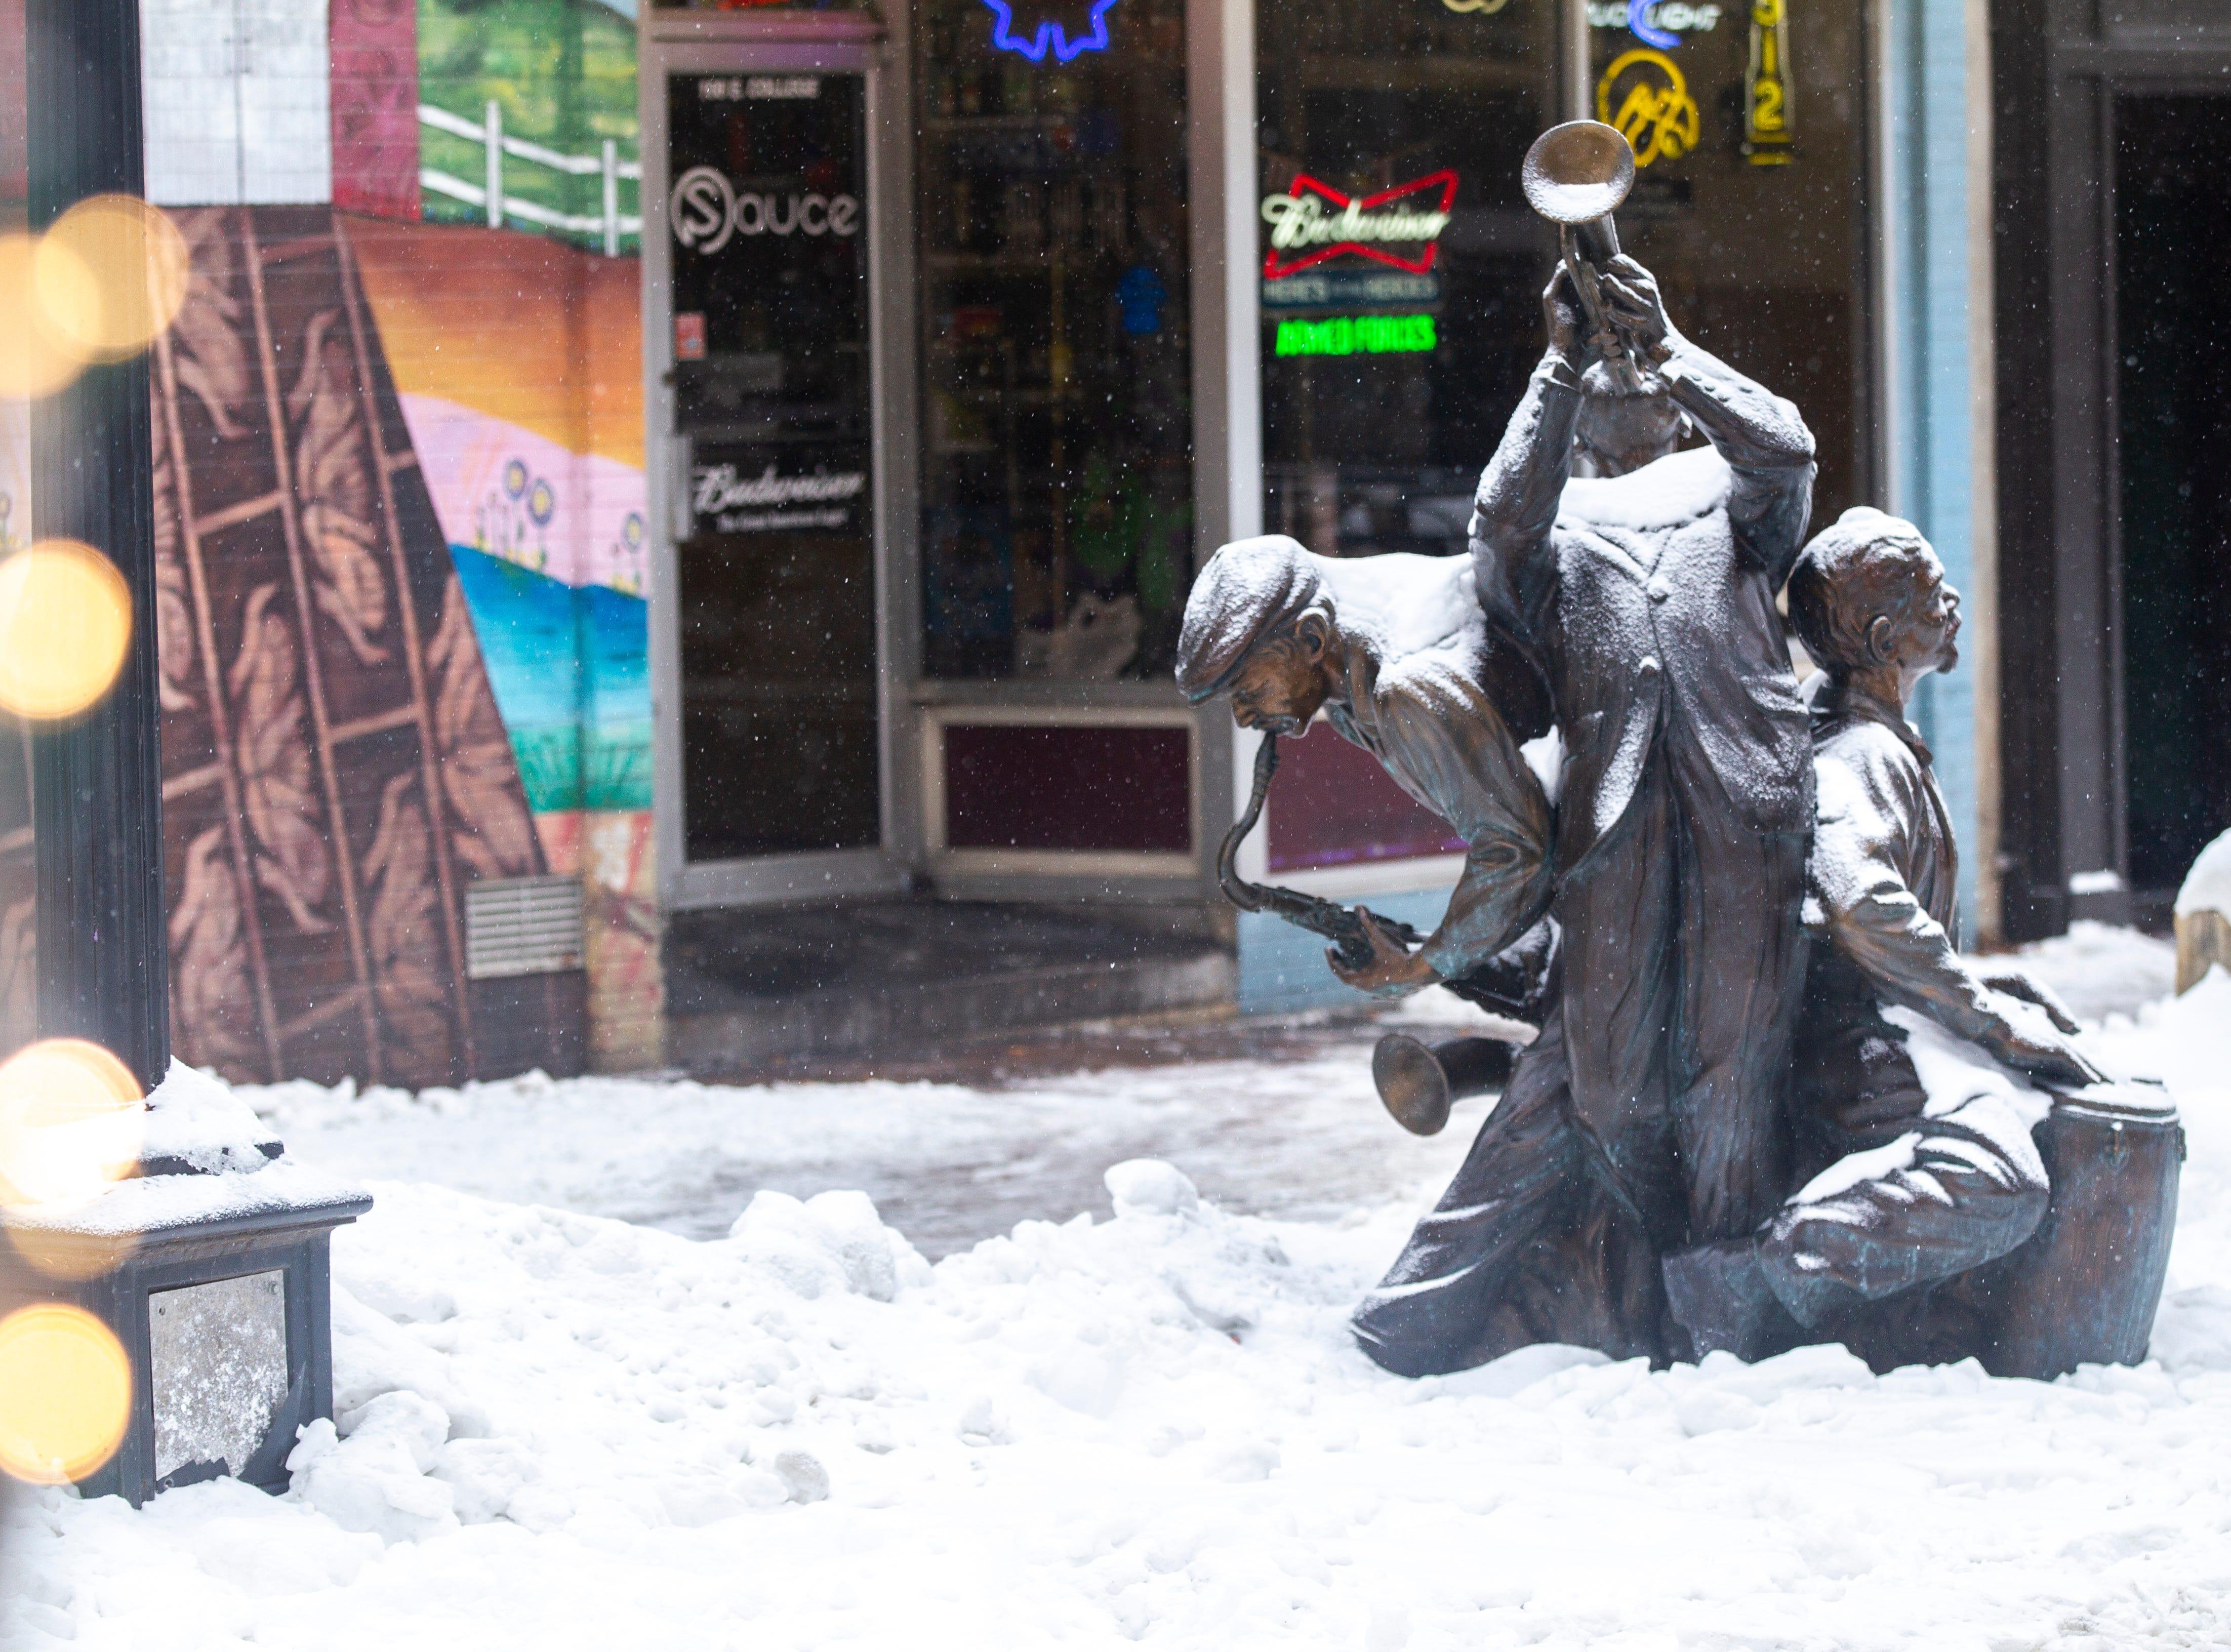 """Jazz"" is seen as light snow falls on Tuesday, Jan. 22, 2019, along the pedestrian mall in Iowa City, Iowa."